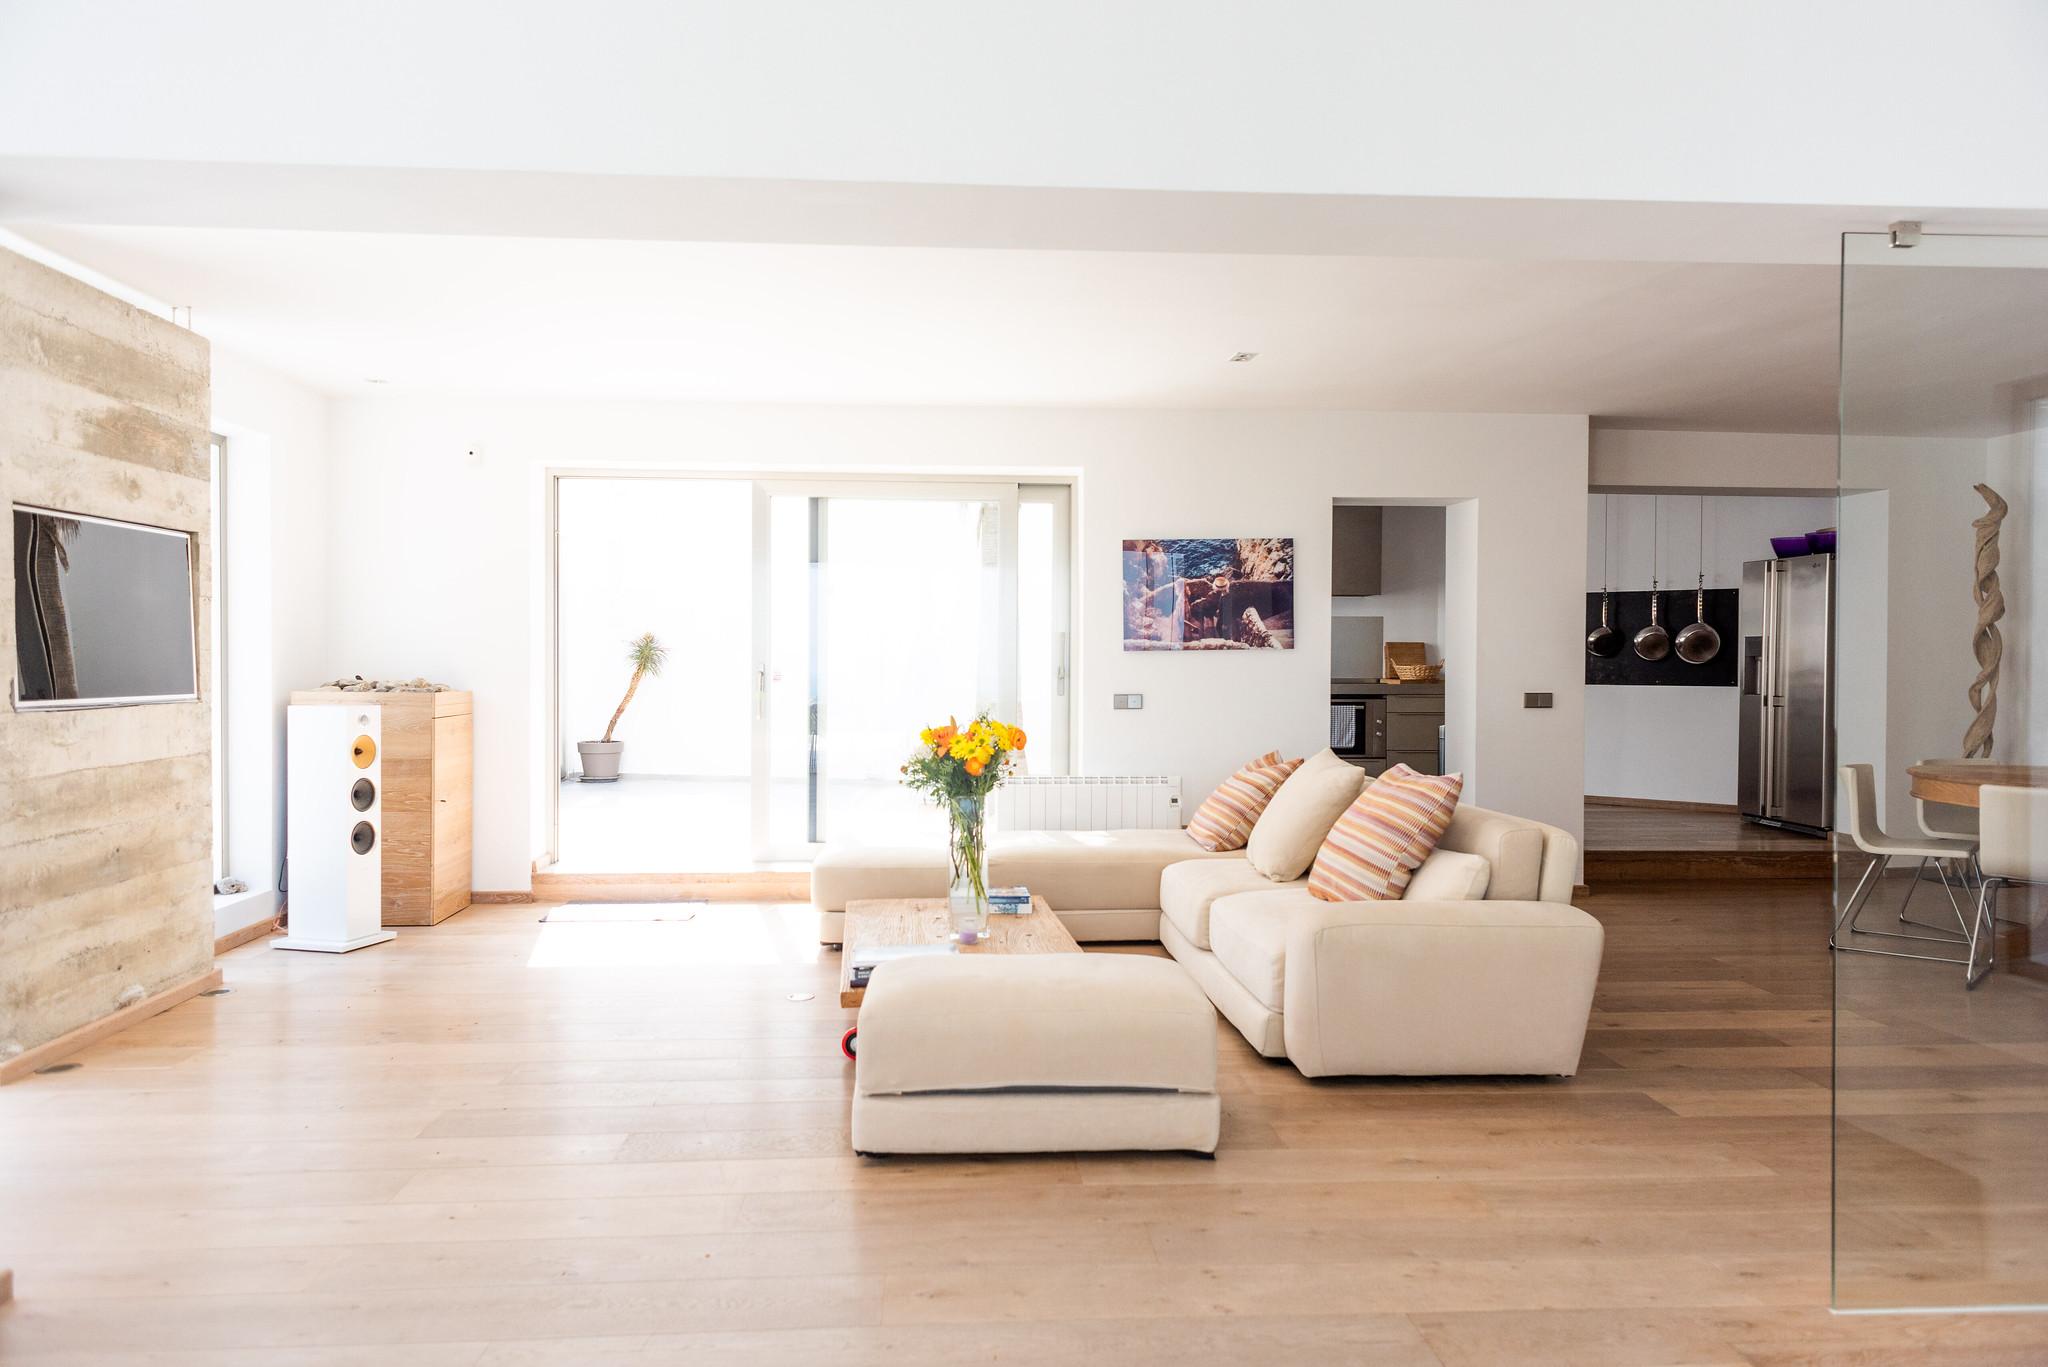 https://www.white-ibiza.com/wp-content/uploads/2020/05/white-ibiza-villas-can-dela-living-room-side-view.jpg